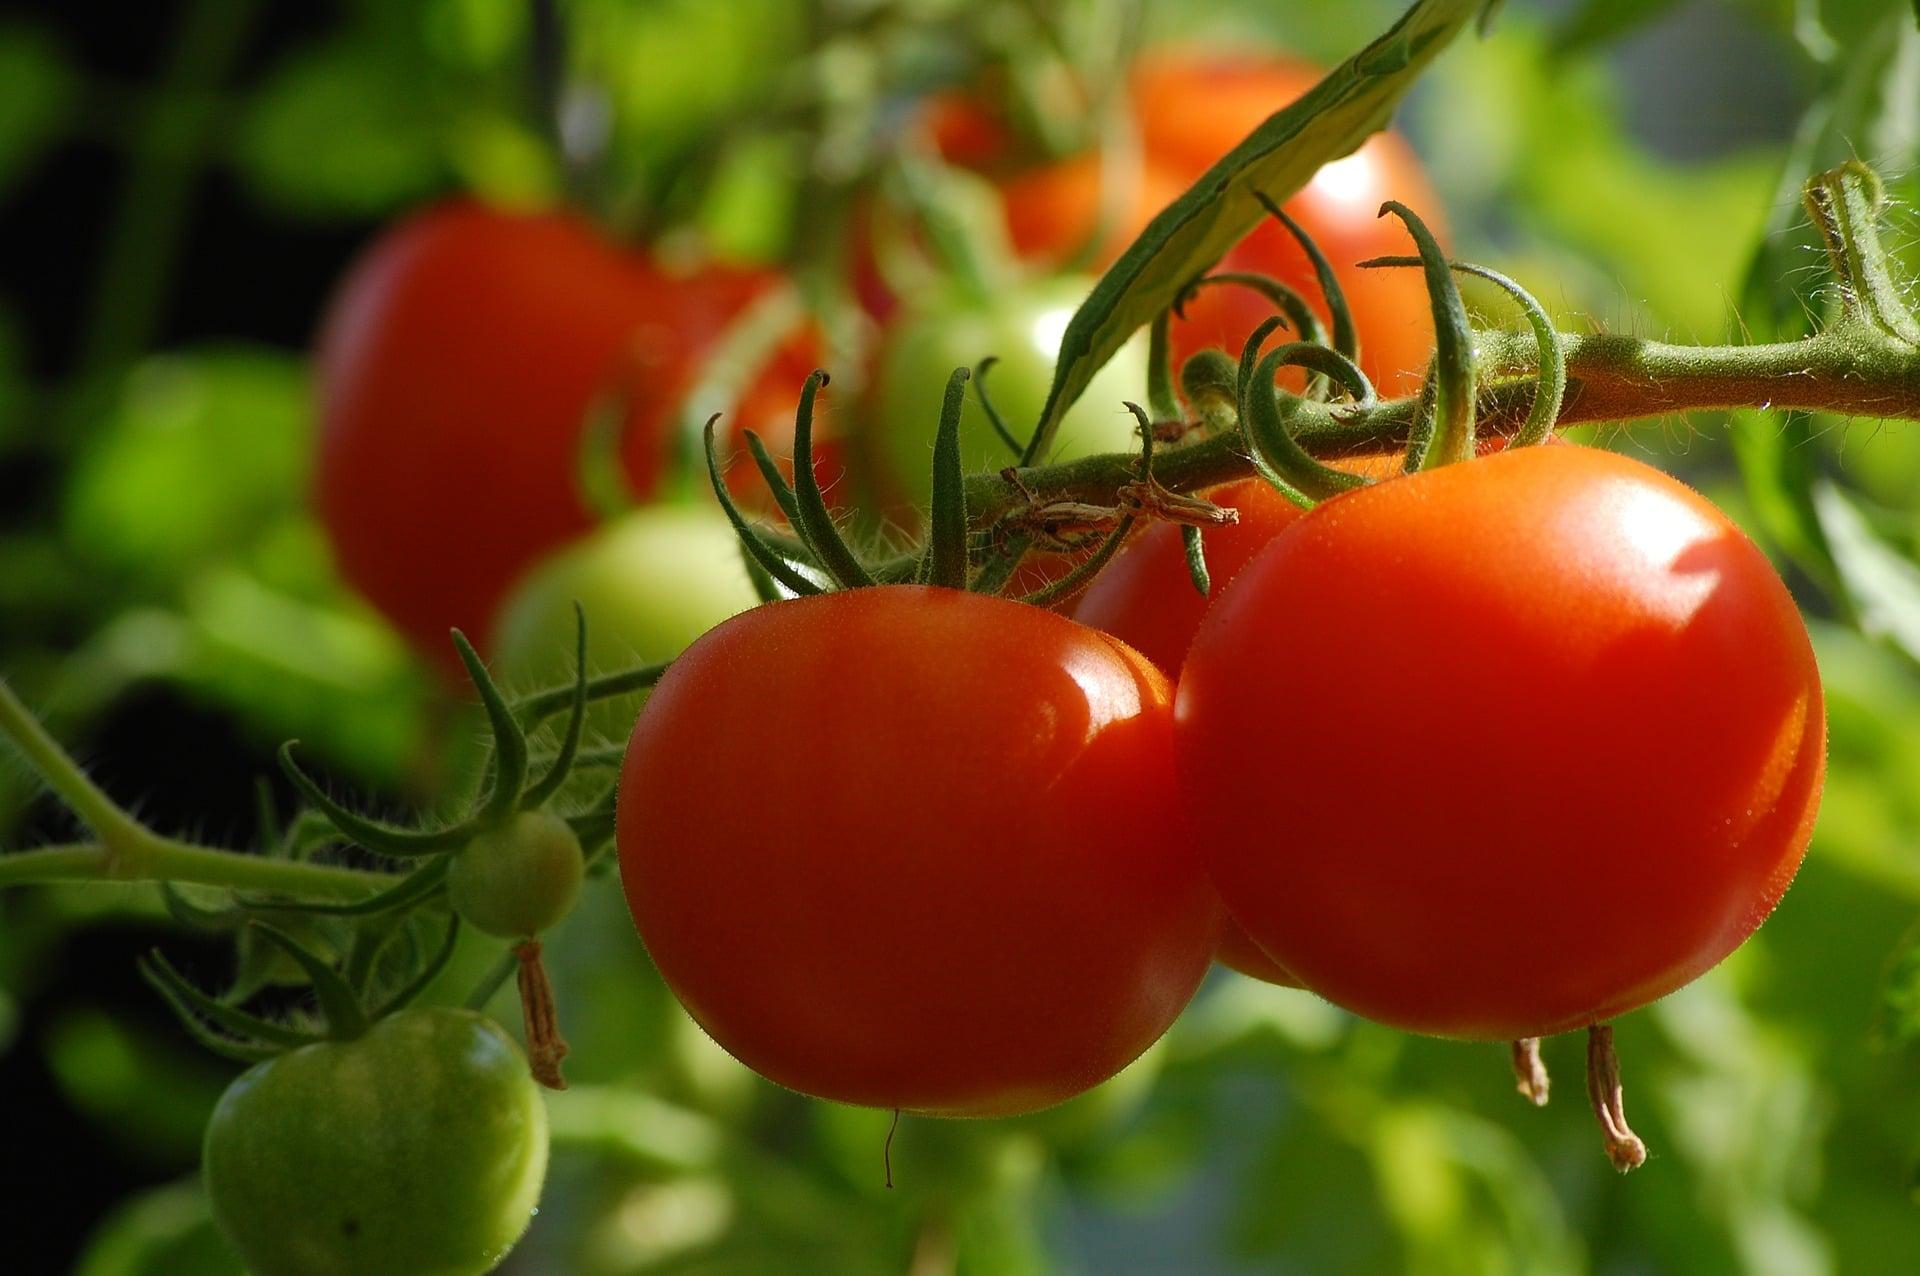 Tomato Small Vegetable Plants